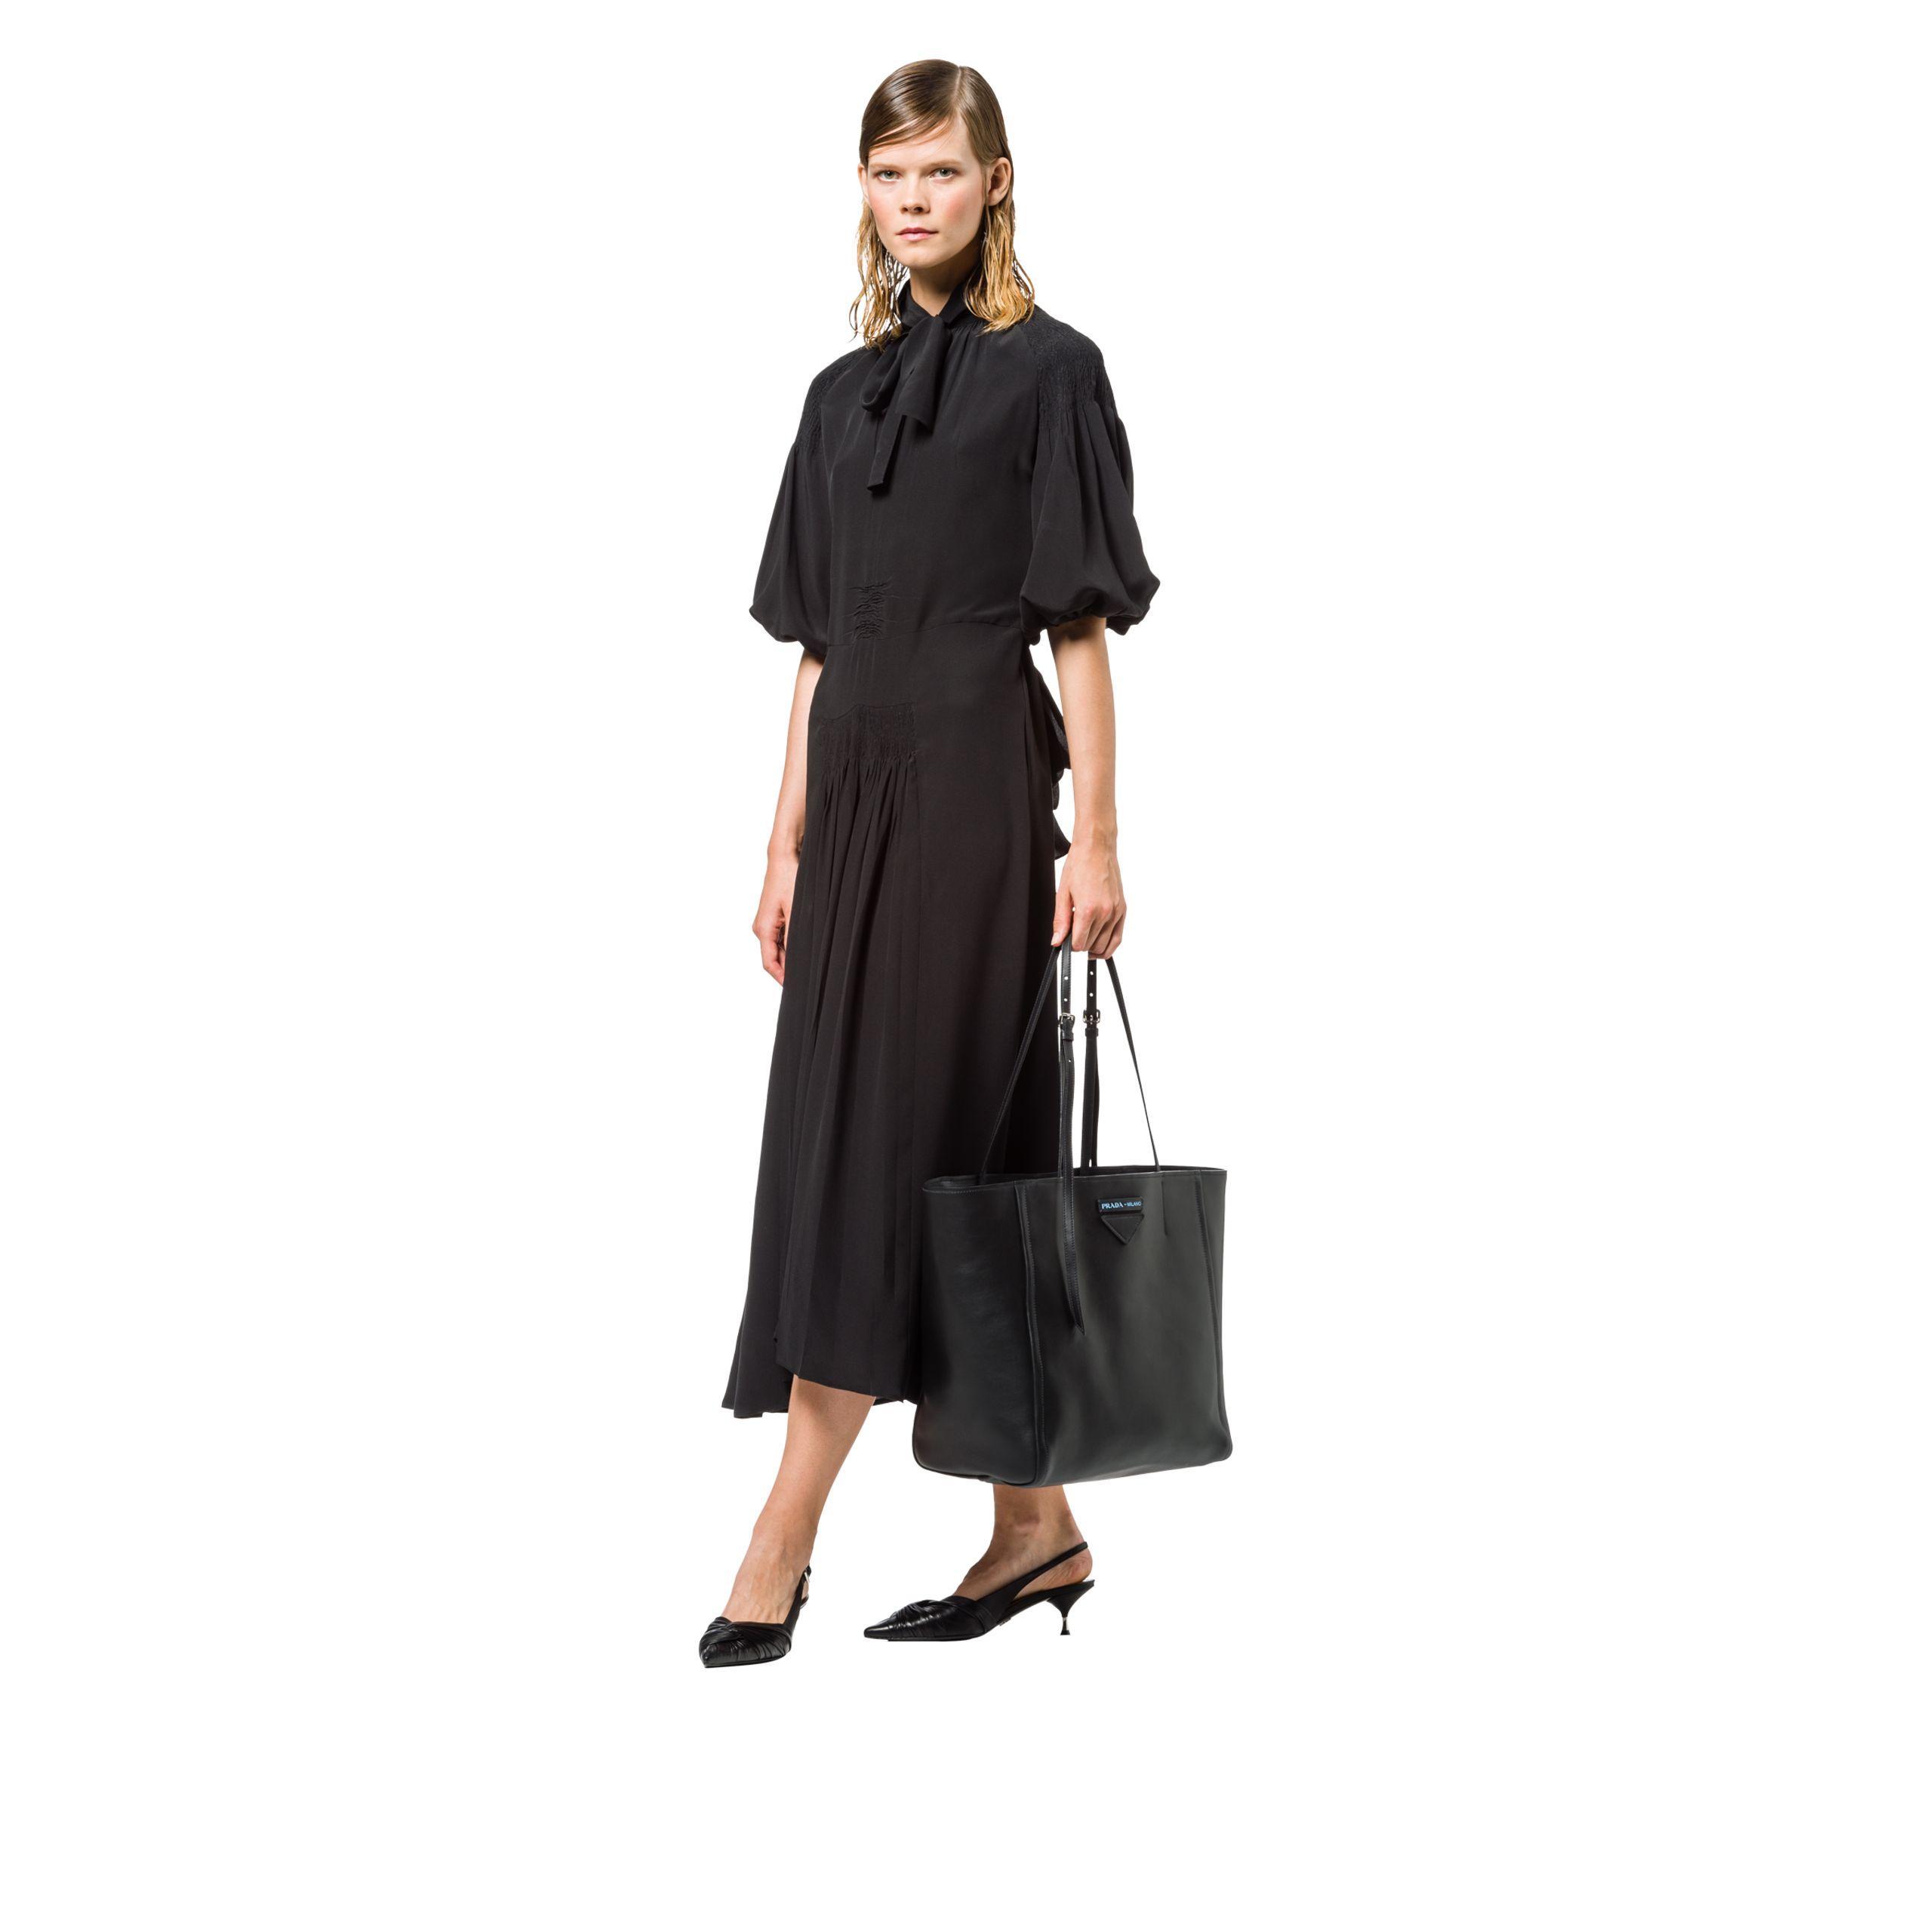 61abe80a3373ee Prada Concept Medium Leather Tote in Black - Lyst